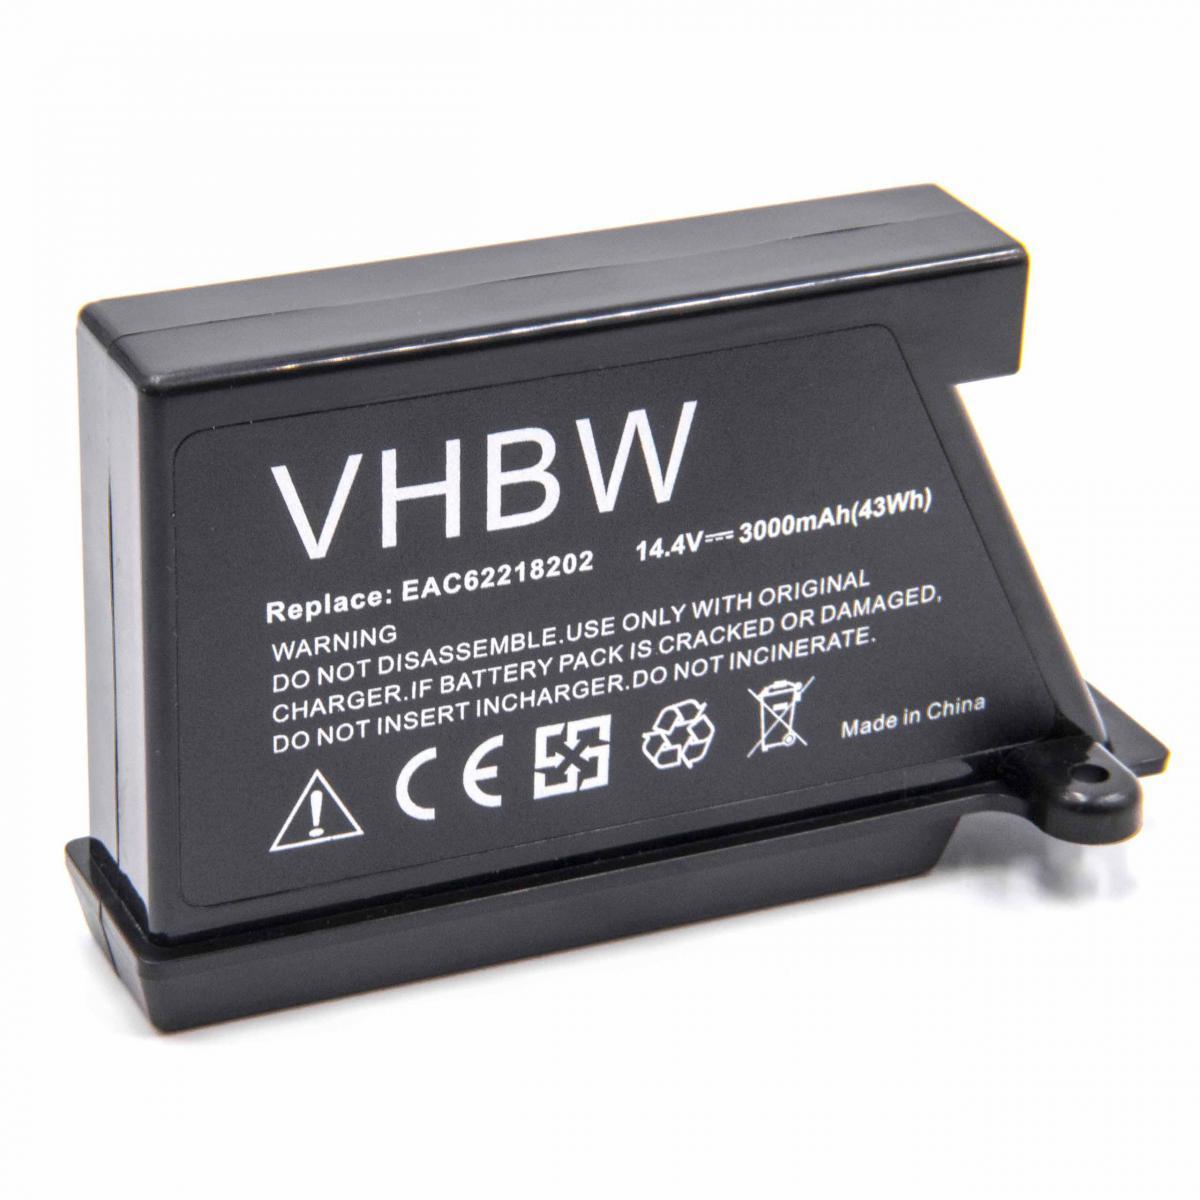 Vhbw vhbw Batterie compatible avec LG HOM-BOT VR7428SP, VR8600RB, VR8600RR, VRF4042 robot électroménager (3000mAh, 14,4V, Li-